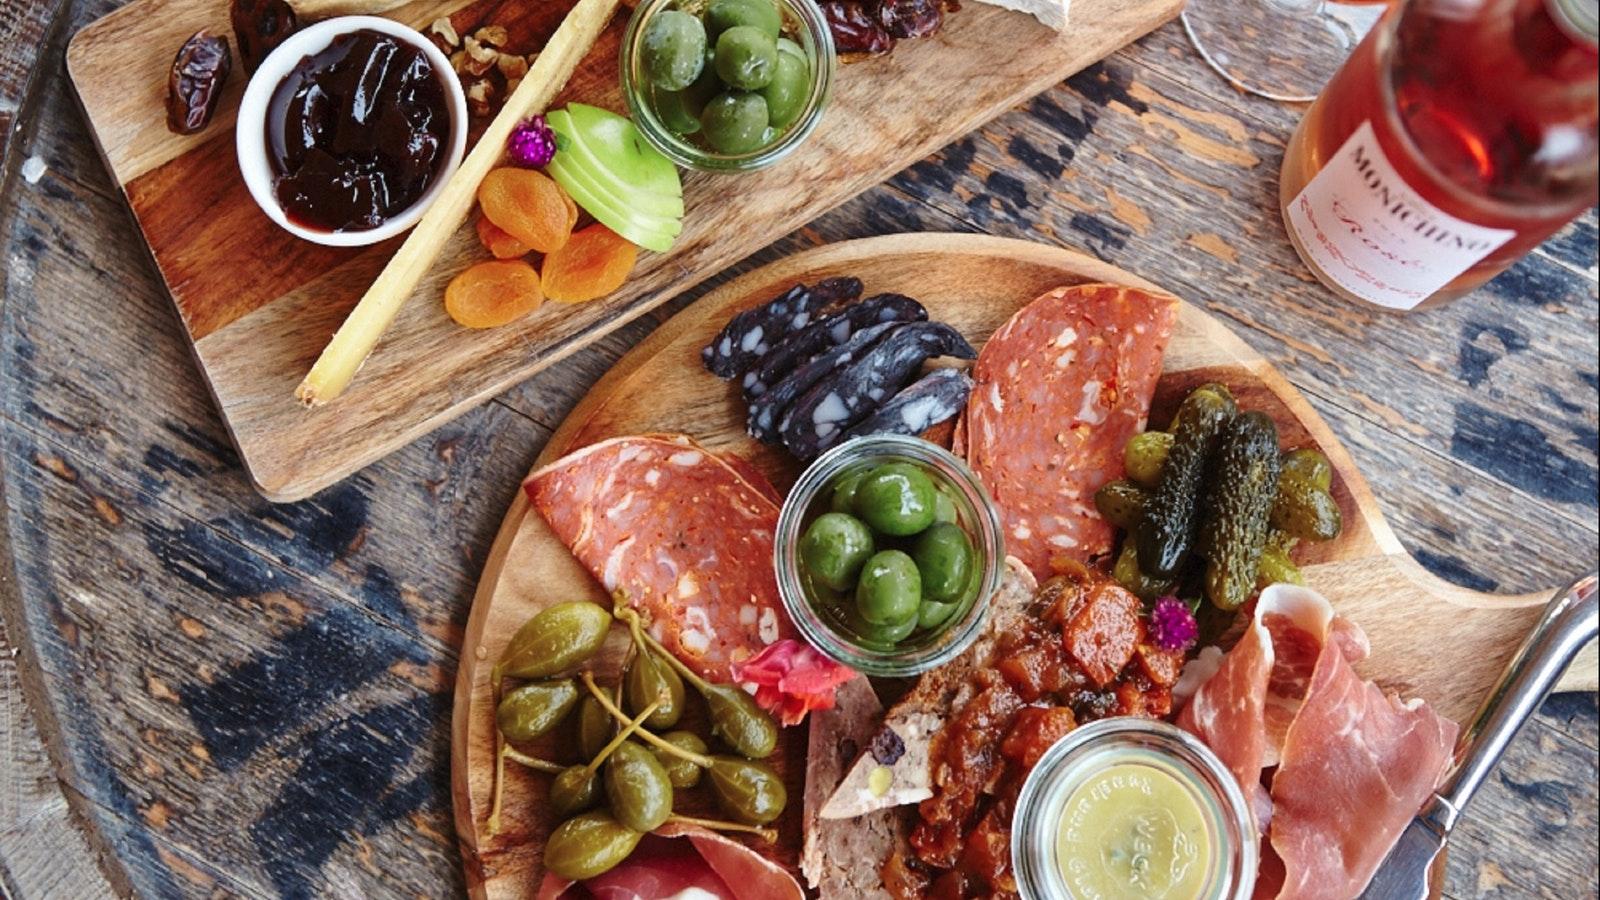 Farm gate platter